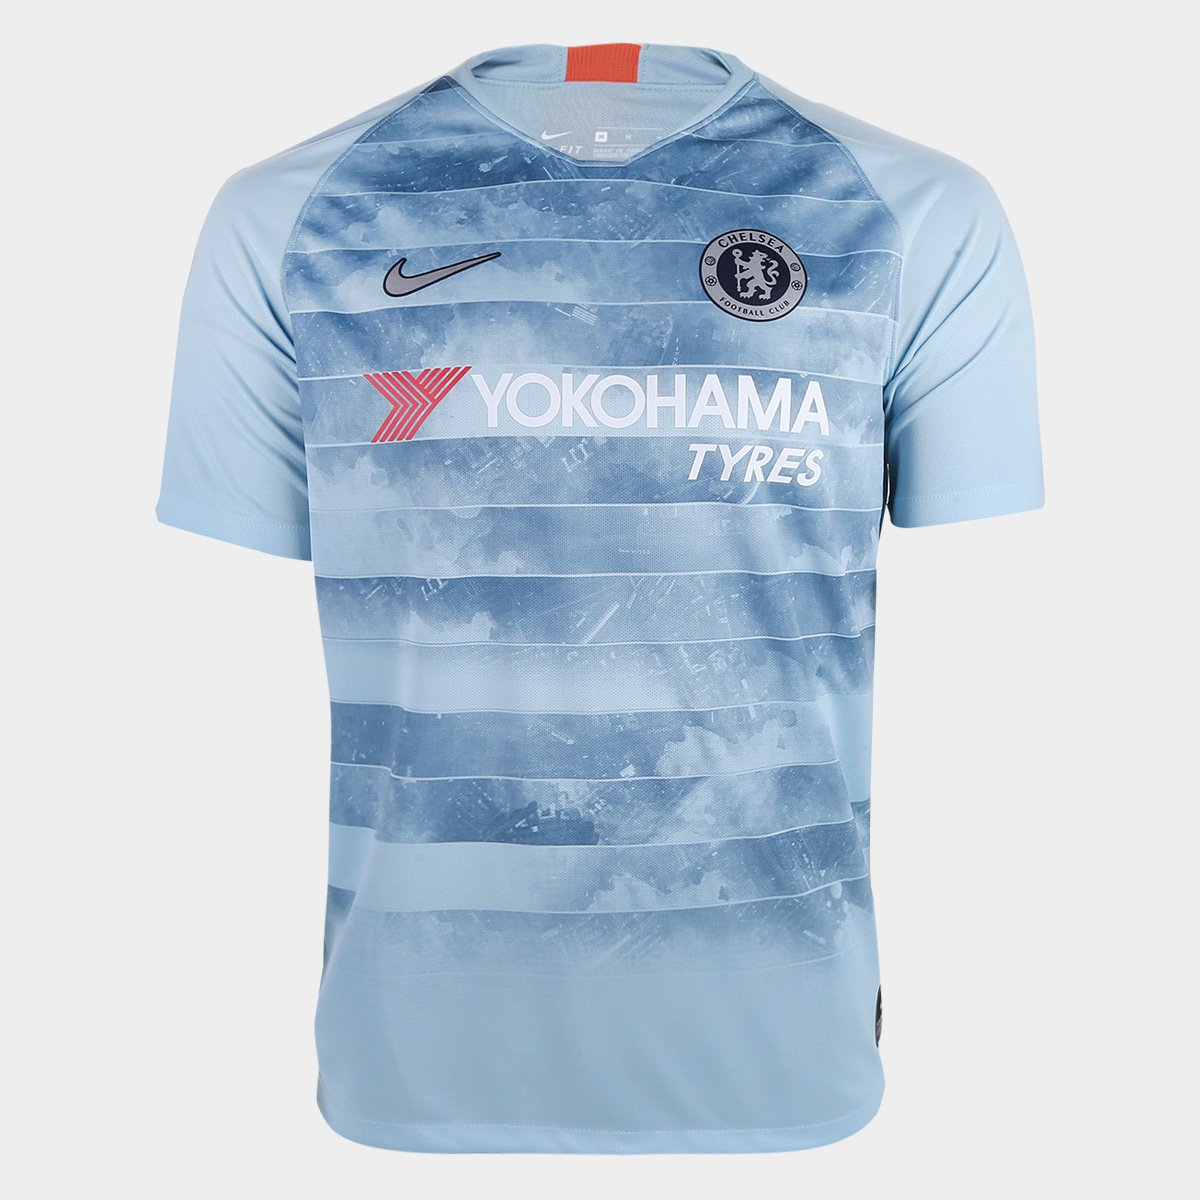 5efad22ee Camisa Chelsea Third 2018 s n° - Torcedor Nike Masculina - Compre Agora